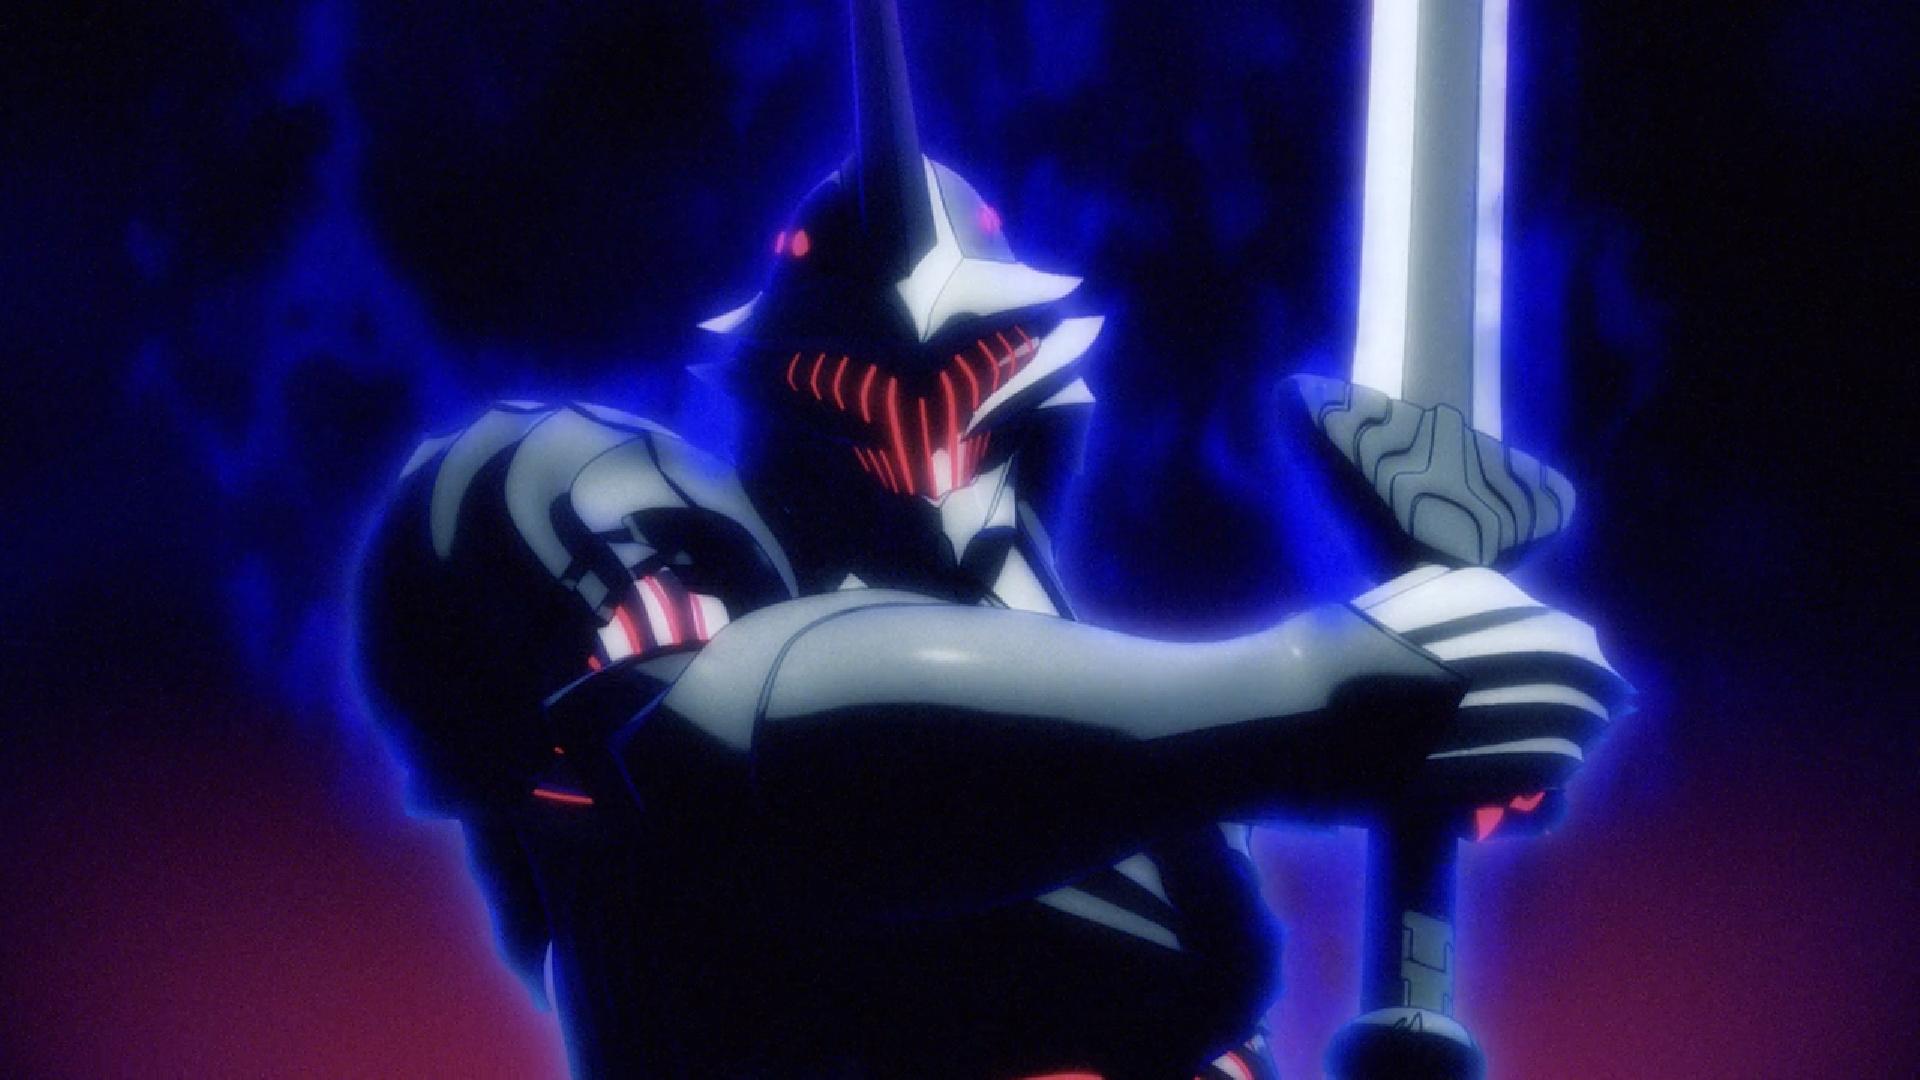 Virtual Haven - SwordGai The Animation Episode 1 Second Image.png